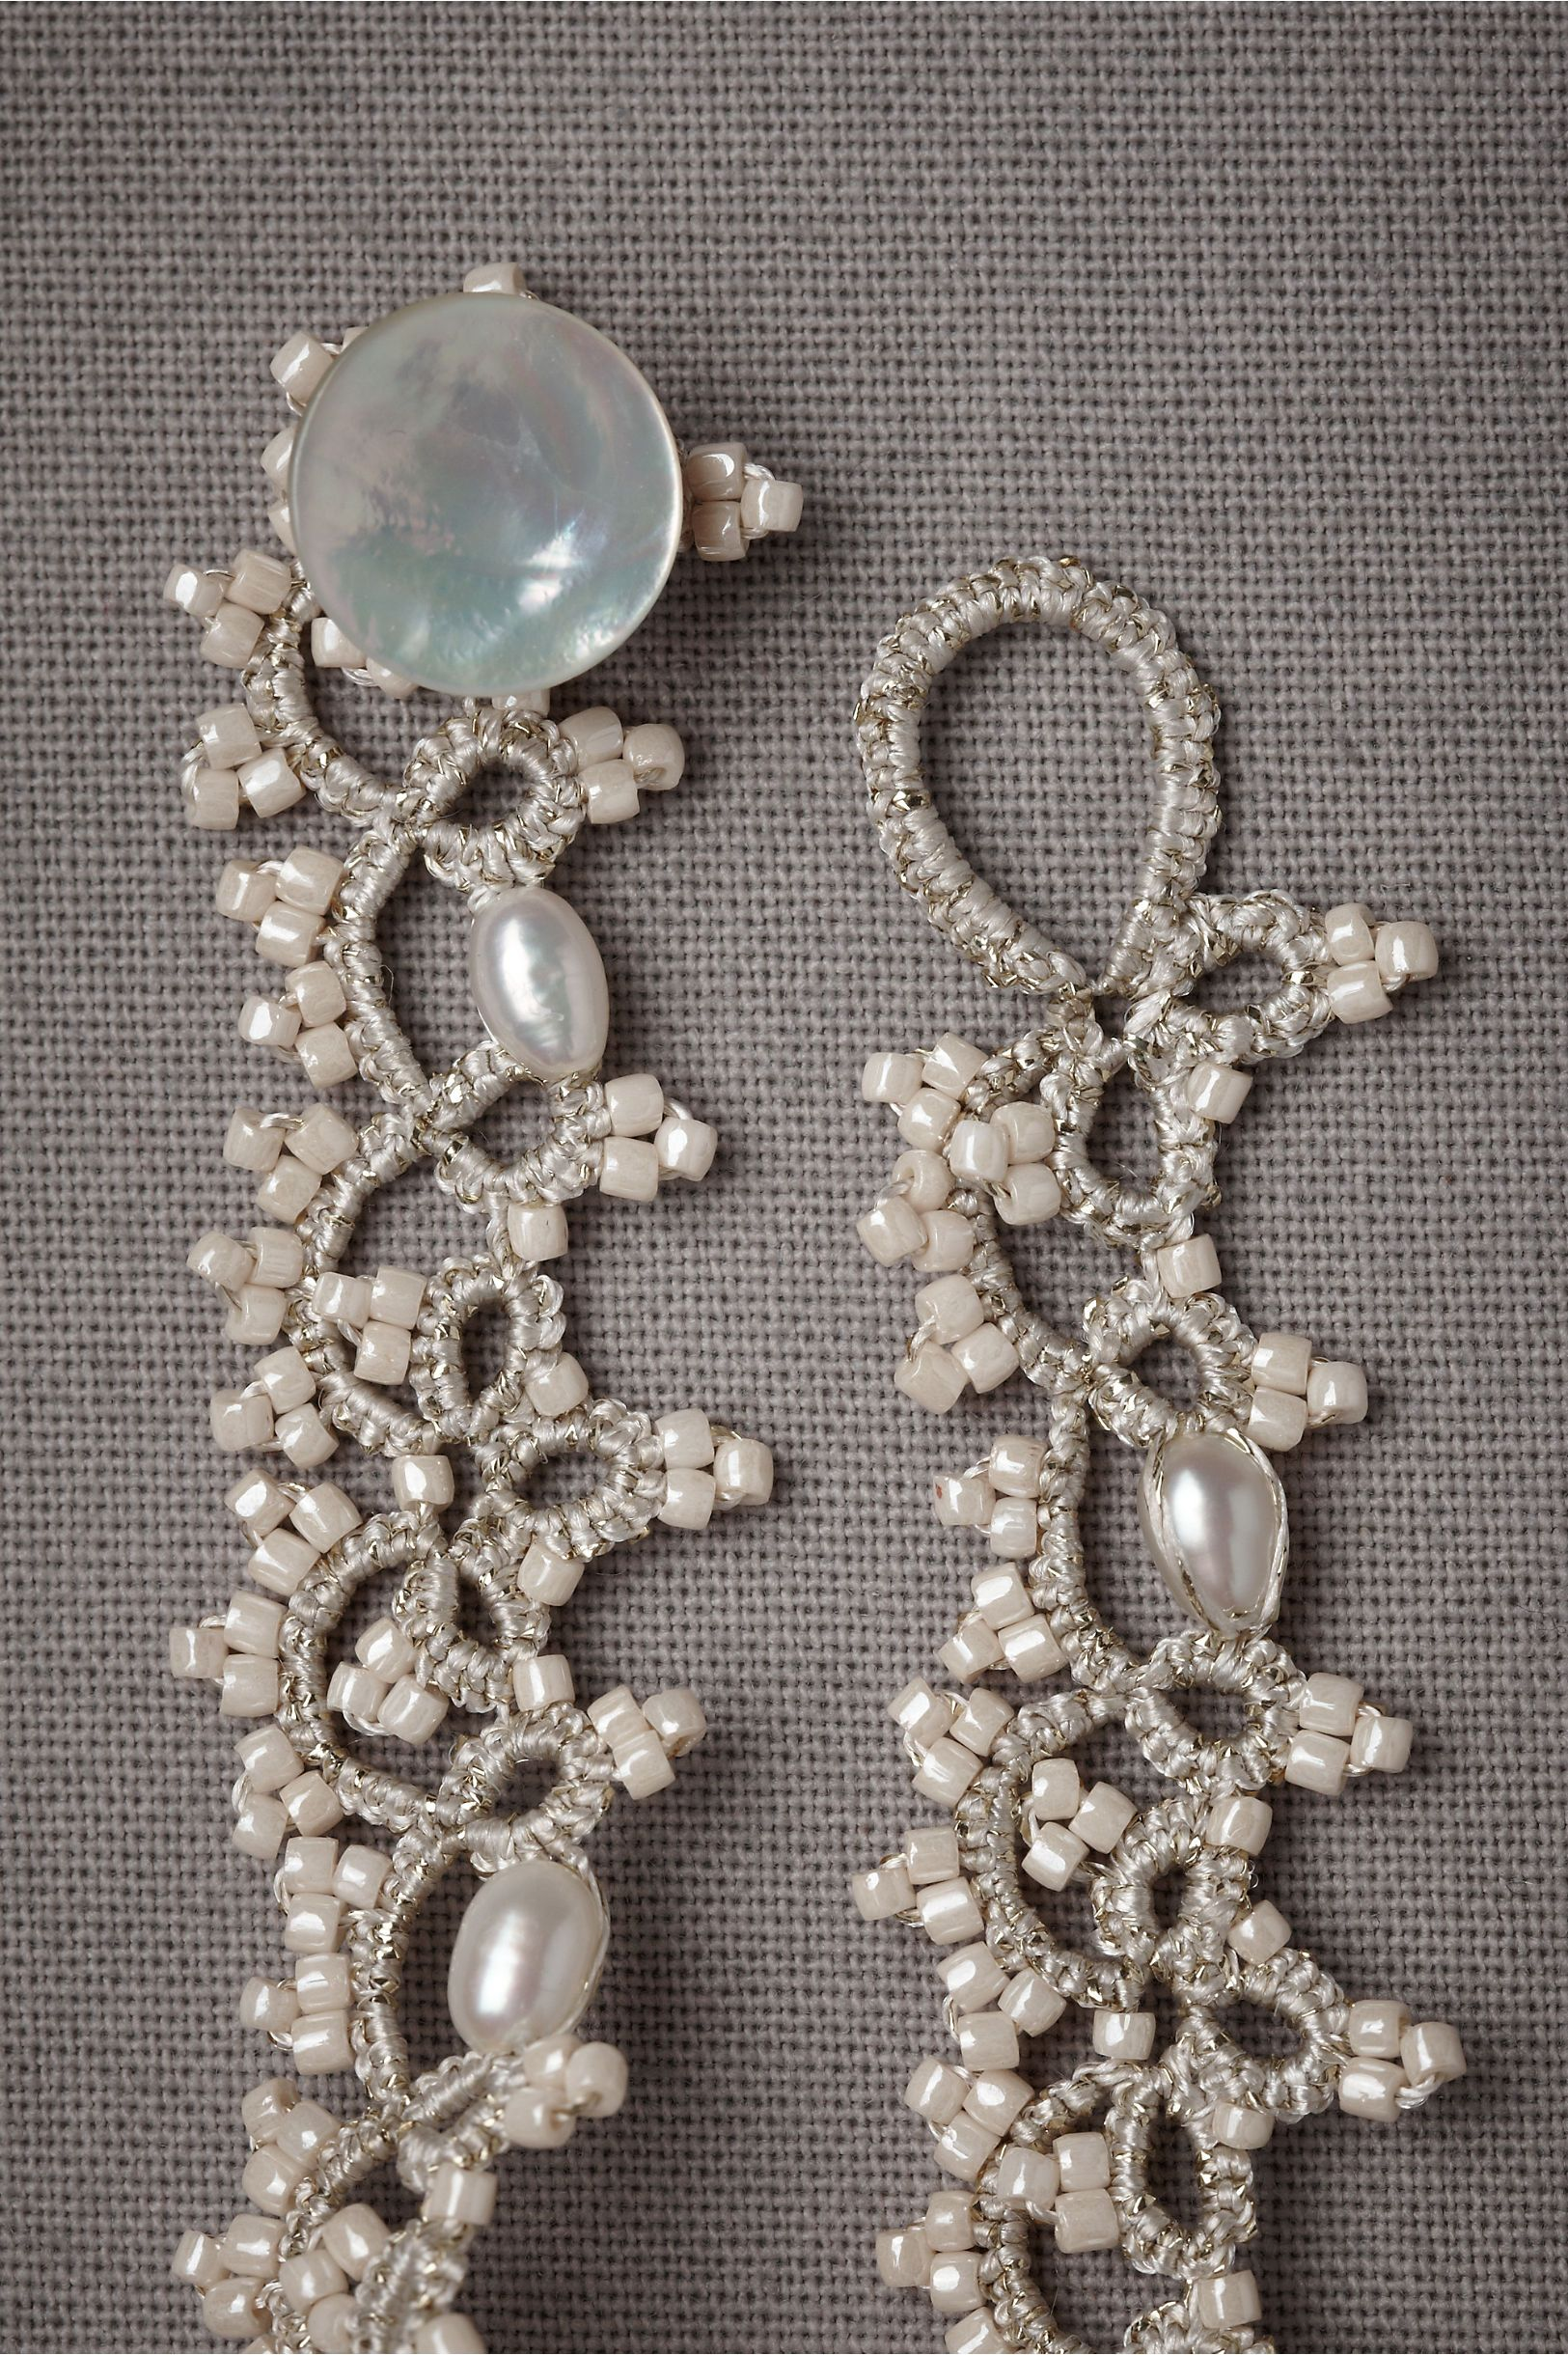 Carolingian Bracelet in The Bride Bridal Jewelry at BHLDN